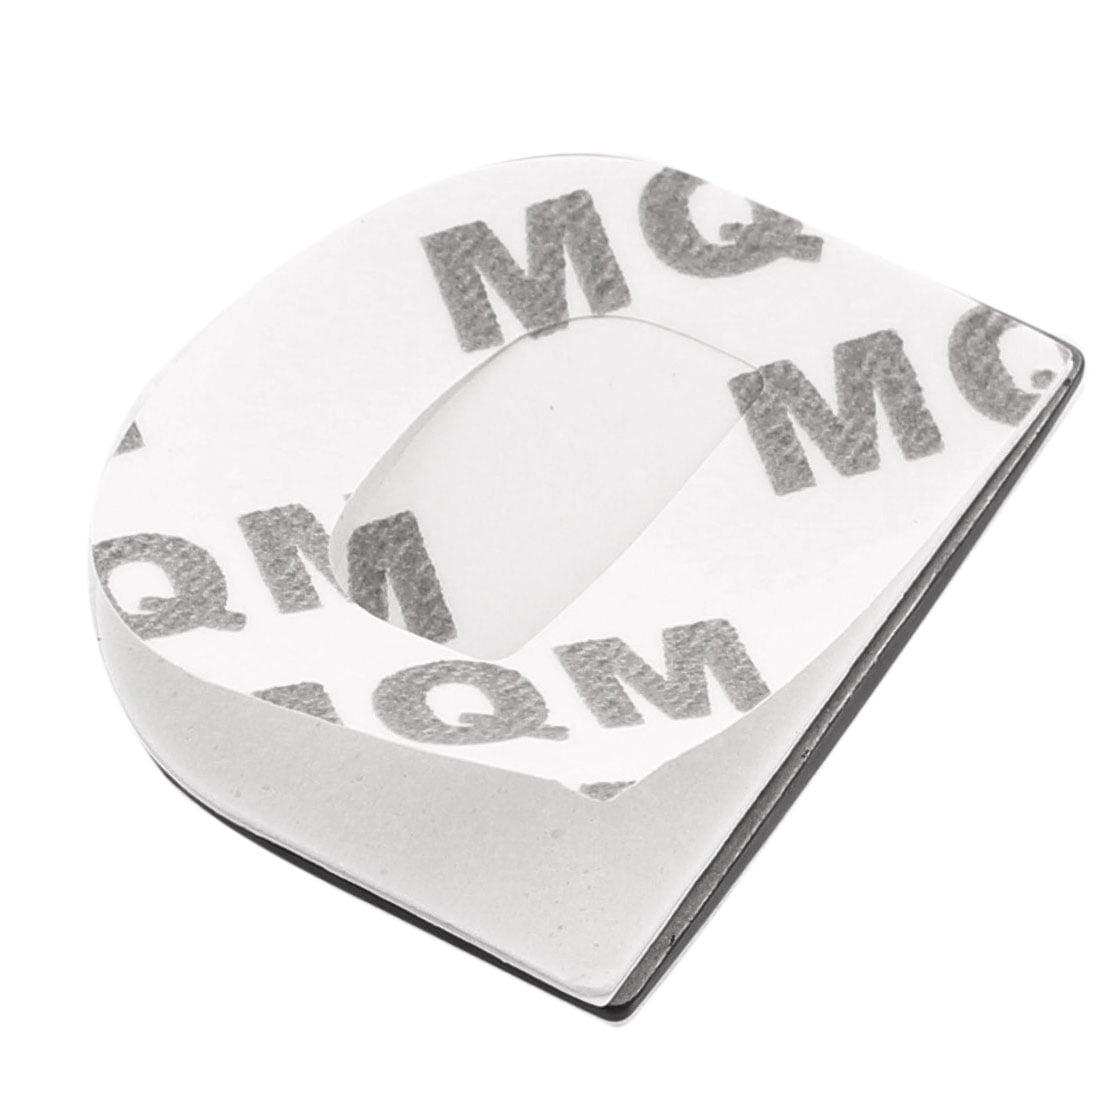 Self Adhesive Round Dot Car 3D Emblem Badge Decal Chrome Symbol Stickers